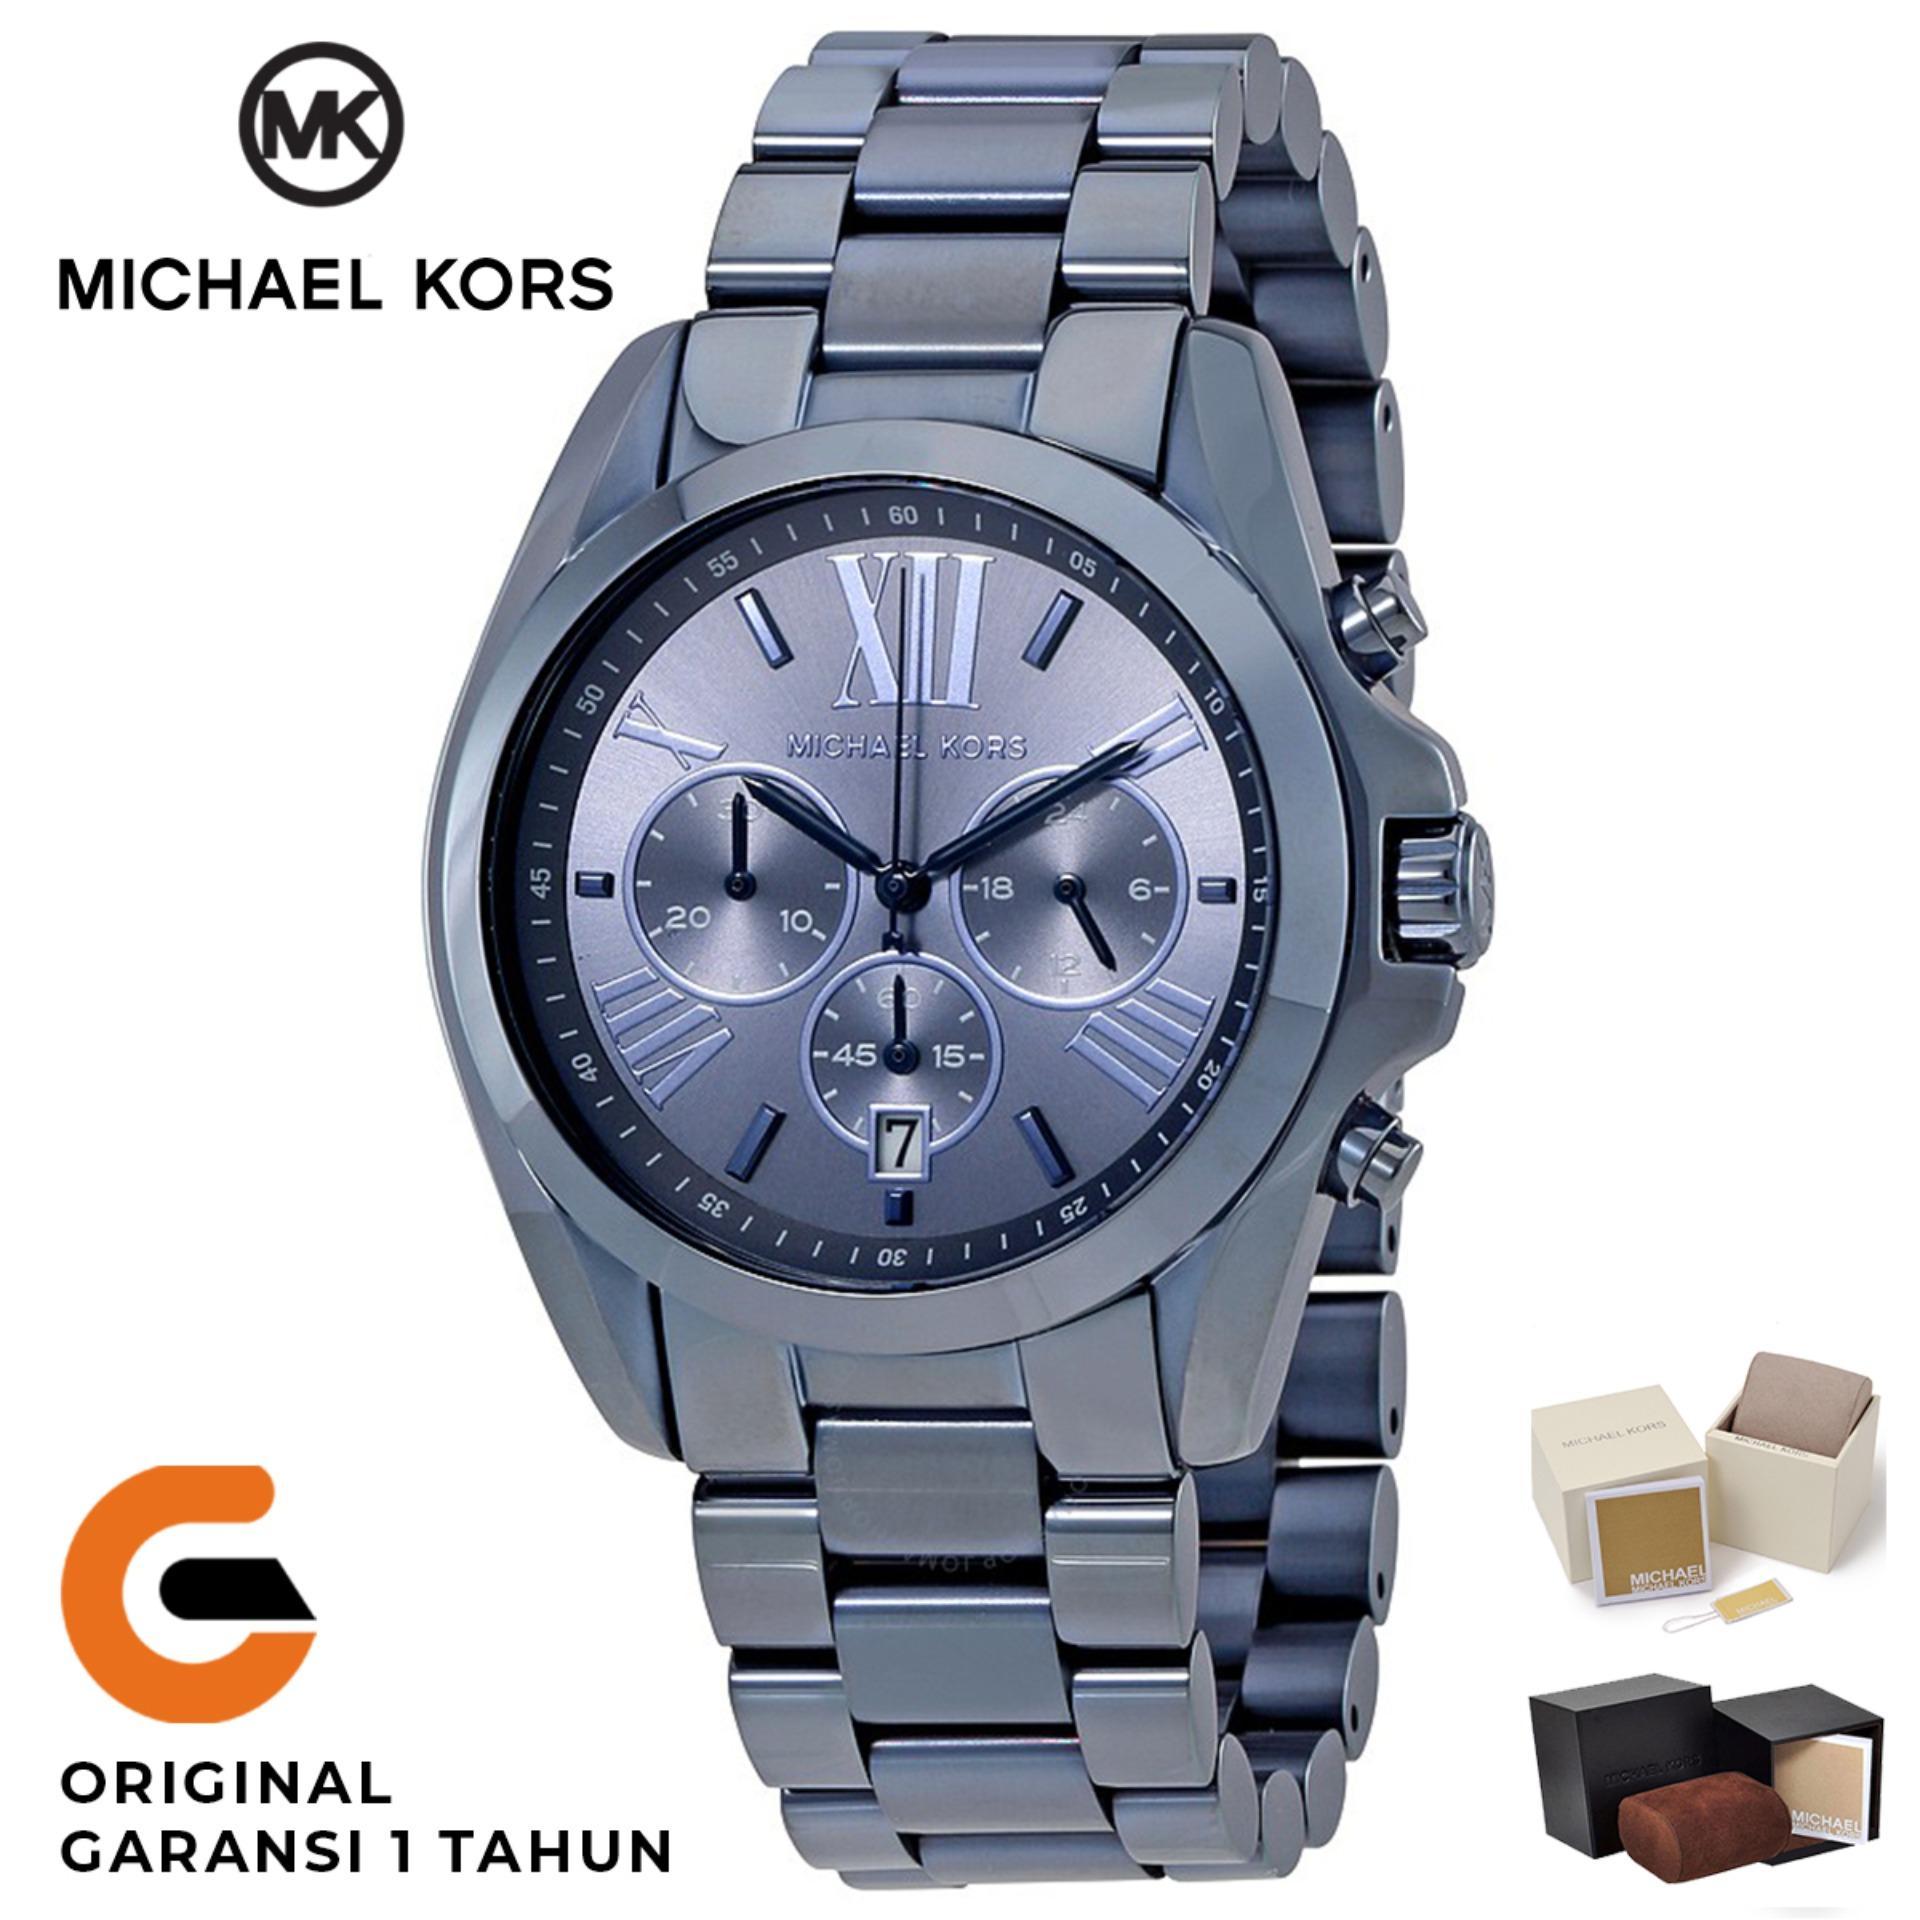 34c490a57638 Michael Kors Watch Original Jam Tangan Wanita Michael Kors Bradshaw MK6248  Tali Rantai Stainless Strap Blue